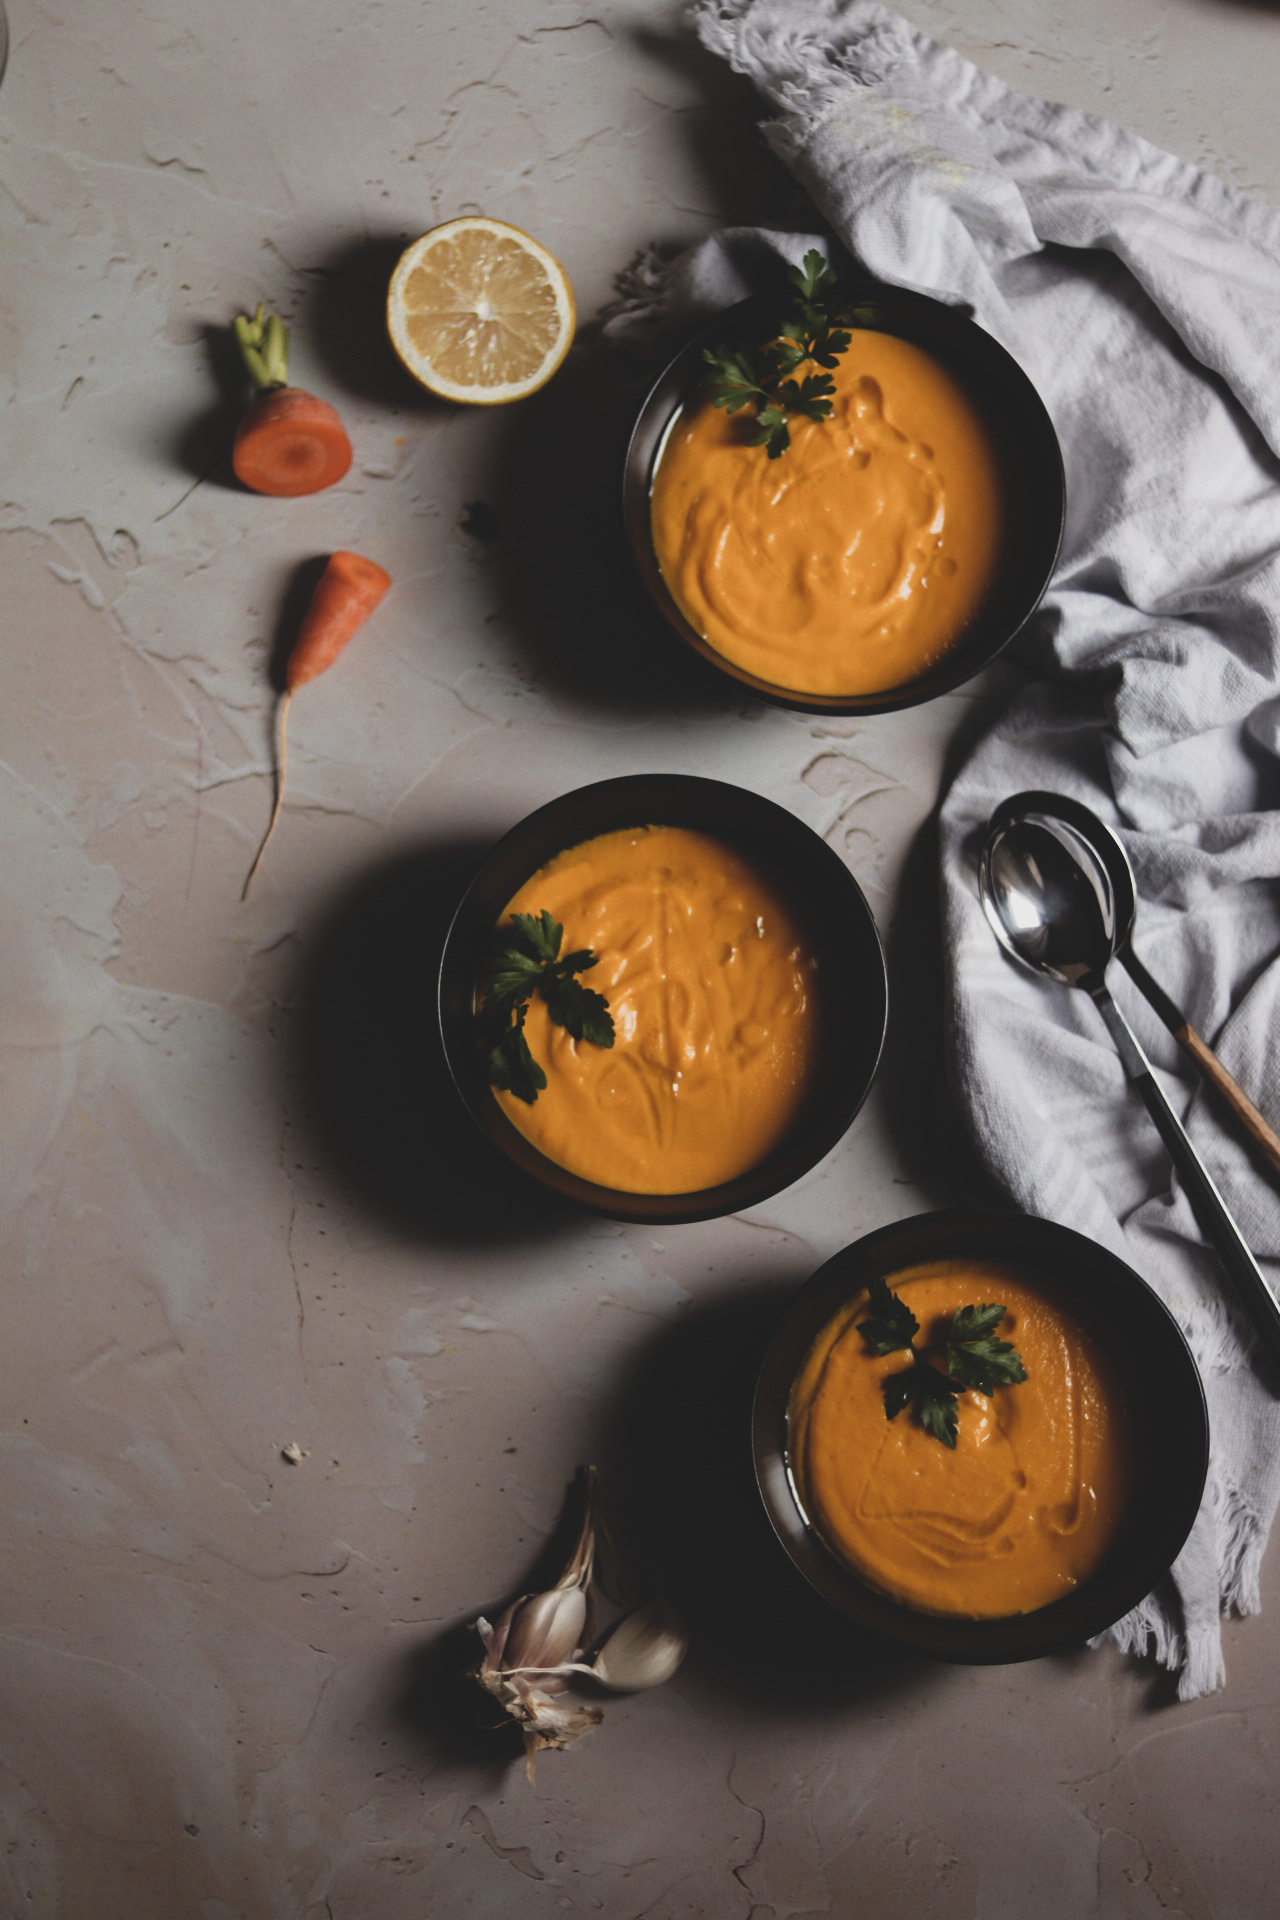 juha od mrkve i đumbira